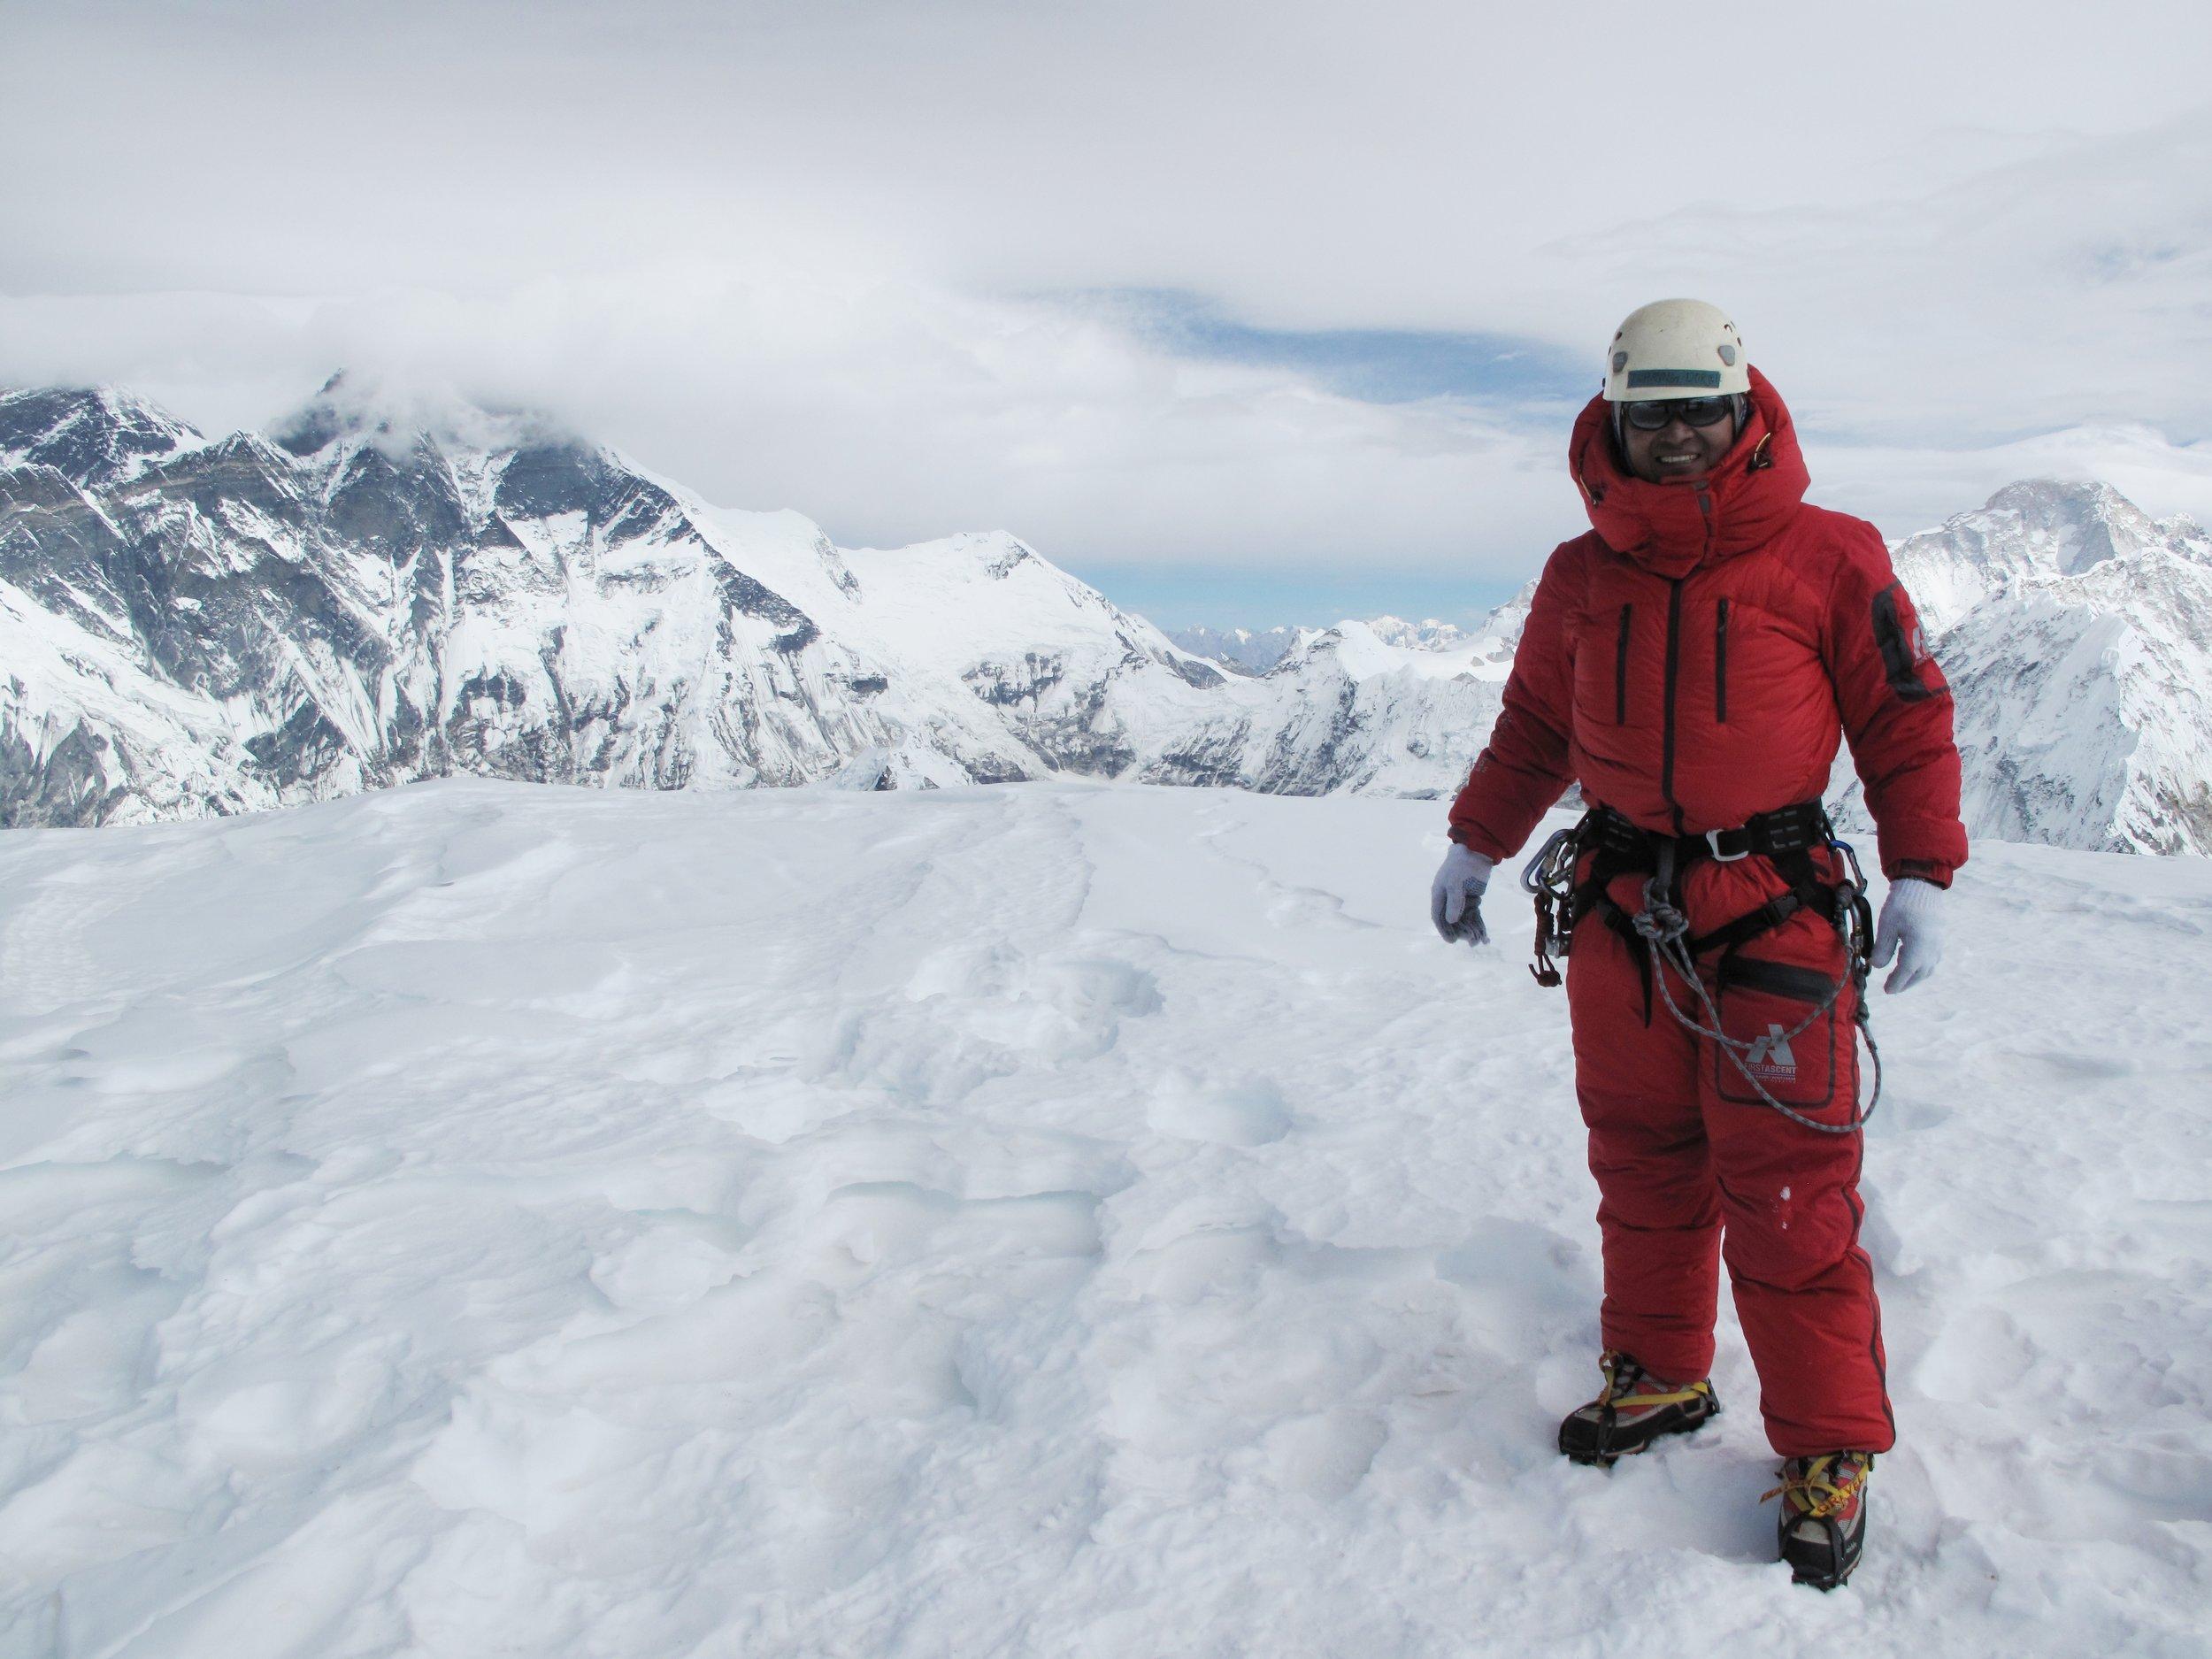 At the summit of Ama Dablam